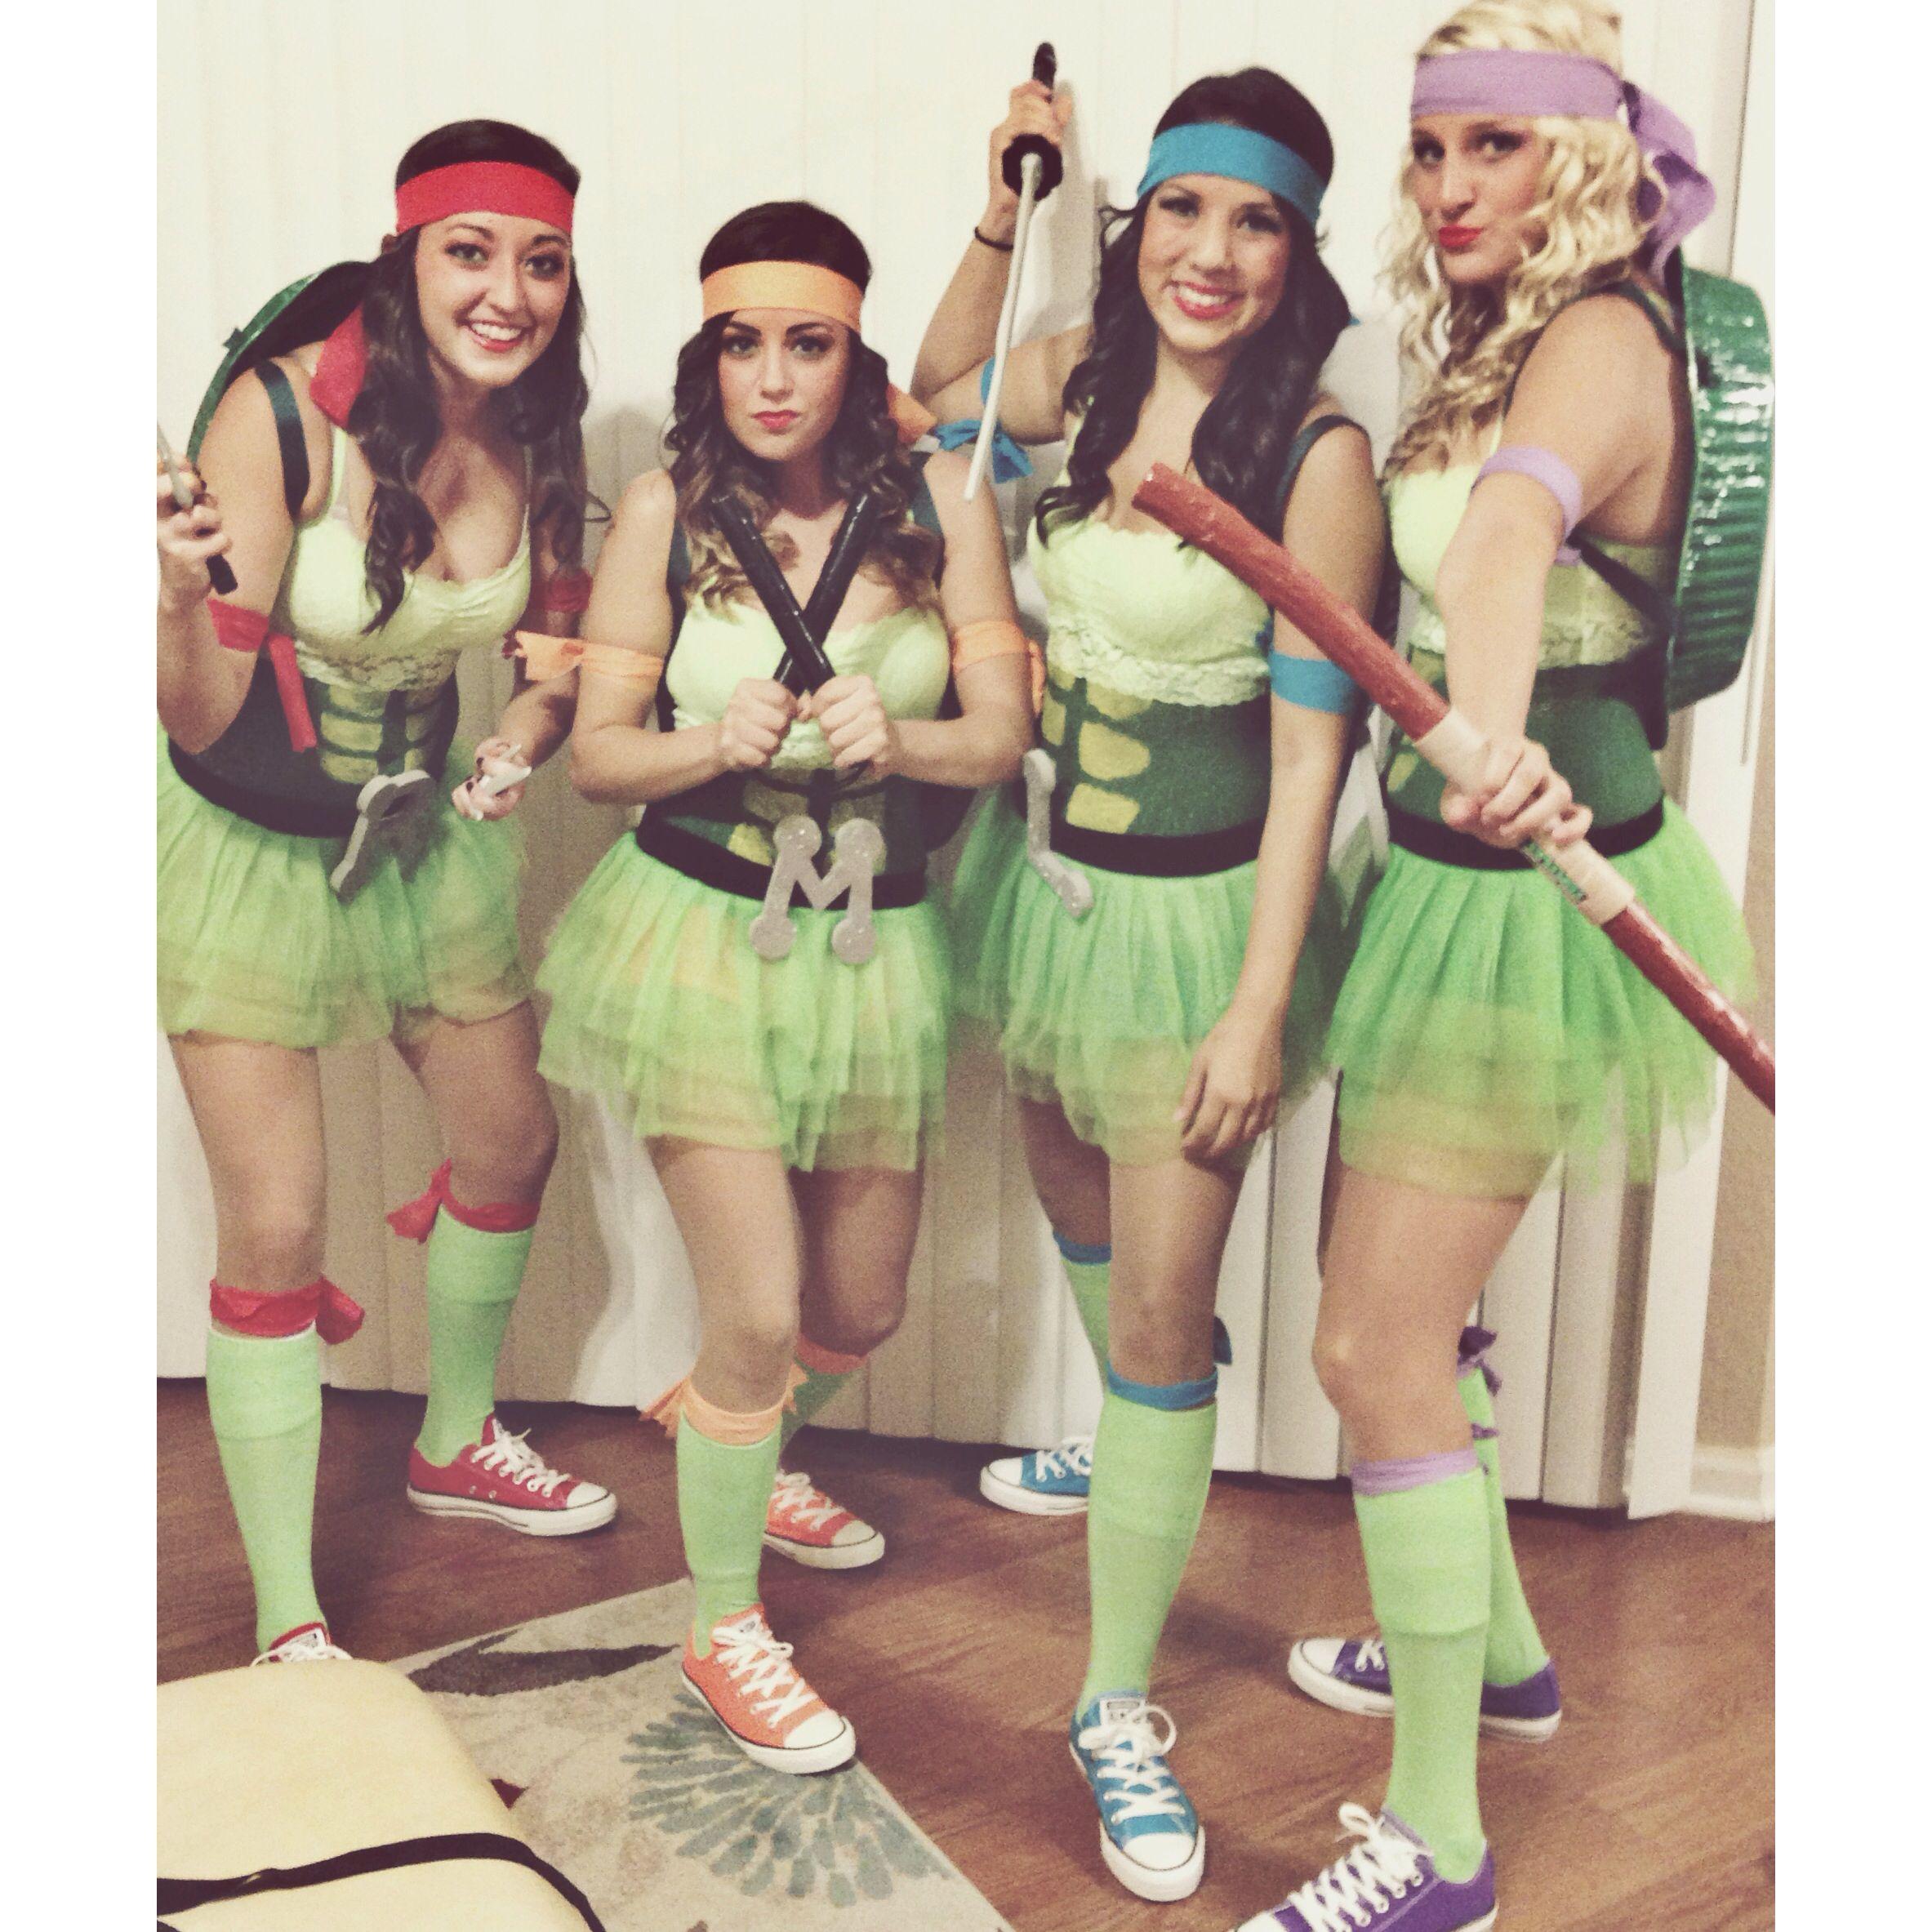 Diy ninja turtle costumes kawabunga dude pinterest diy ninja diy ninja turtle costumes solutioingenieria Image collections